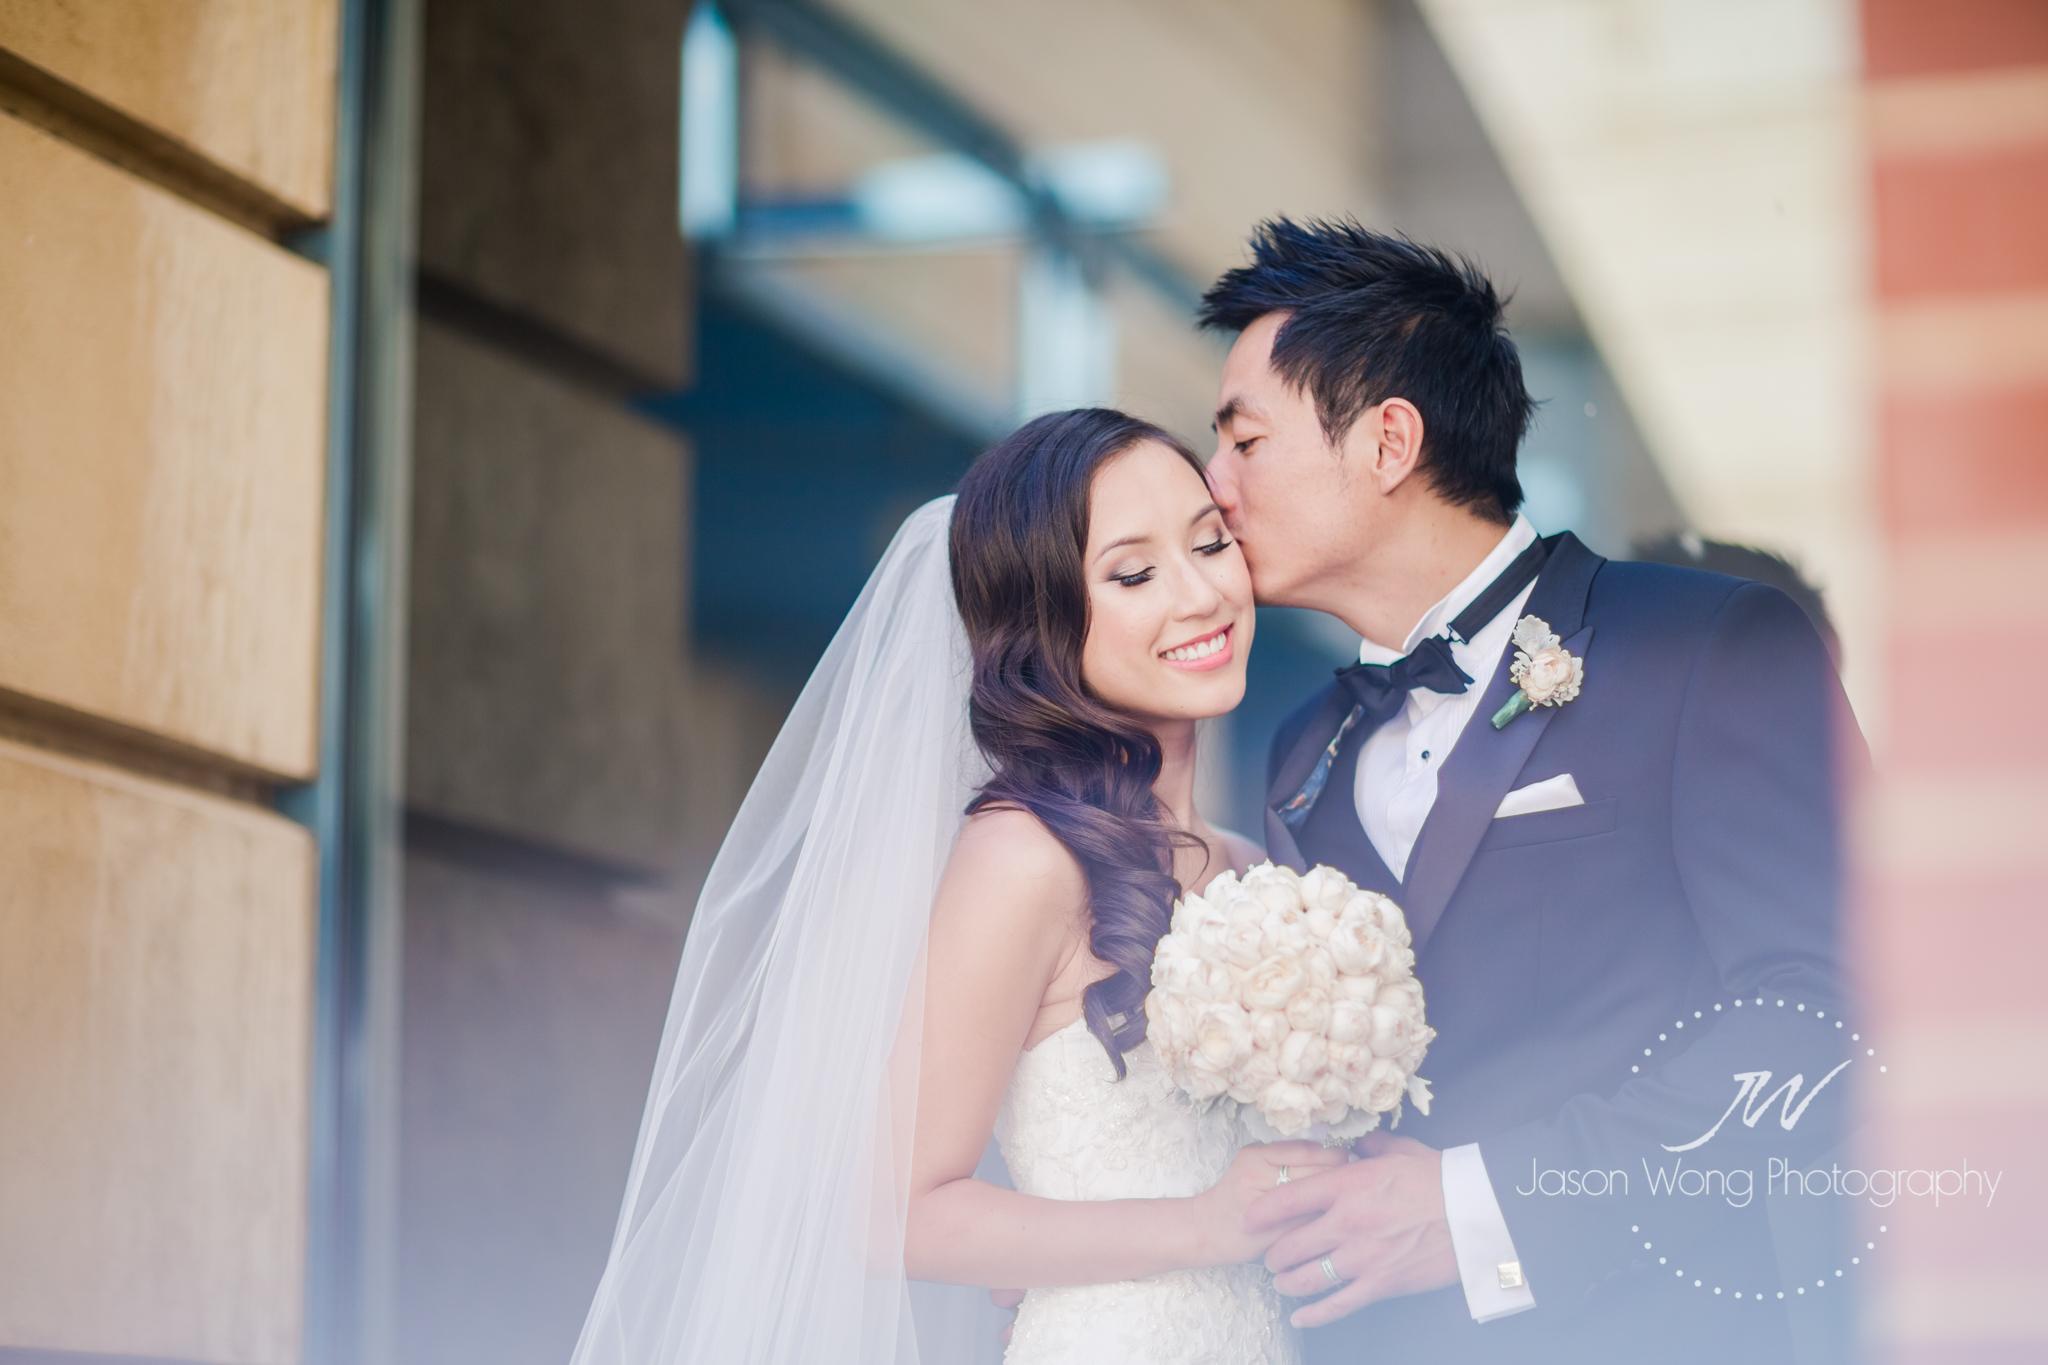 groom-give-sweet-kiss-on-bride-cheek.jpg